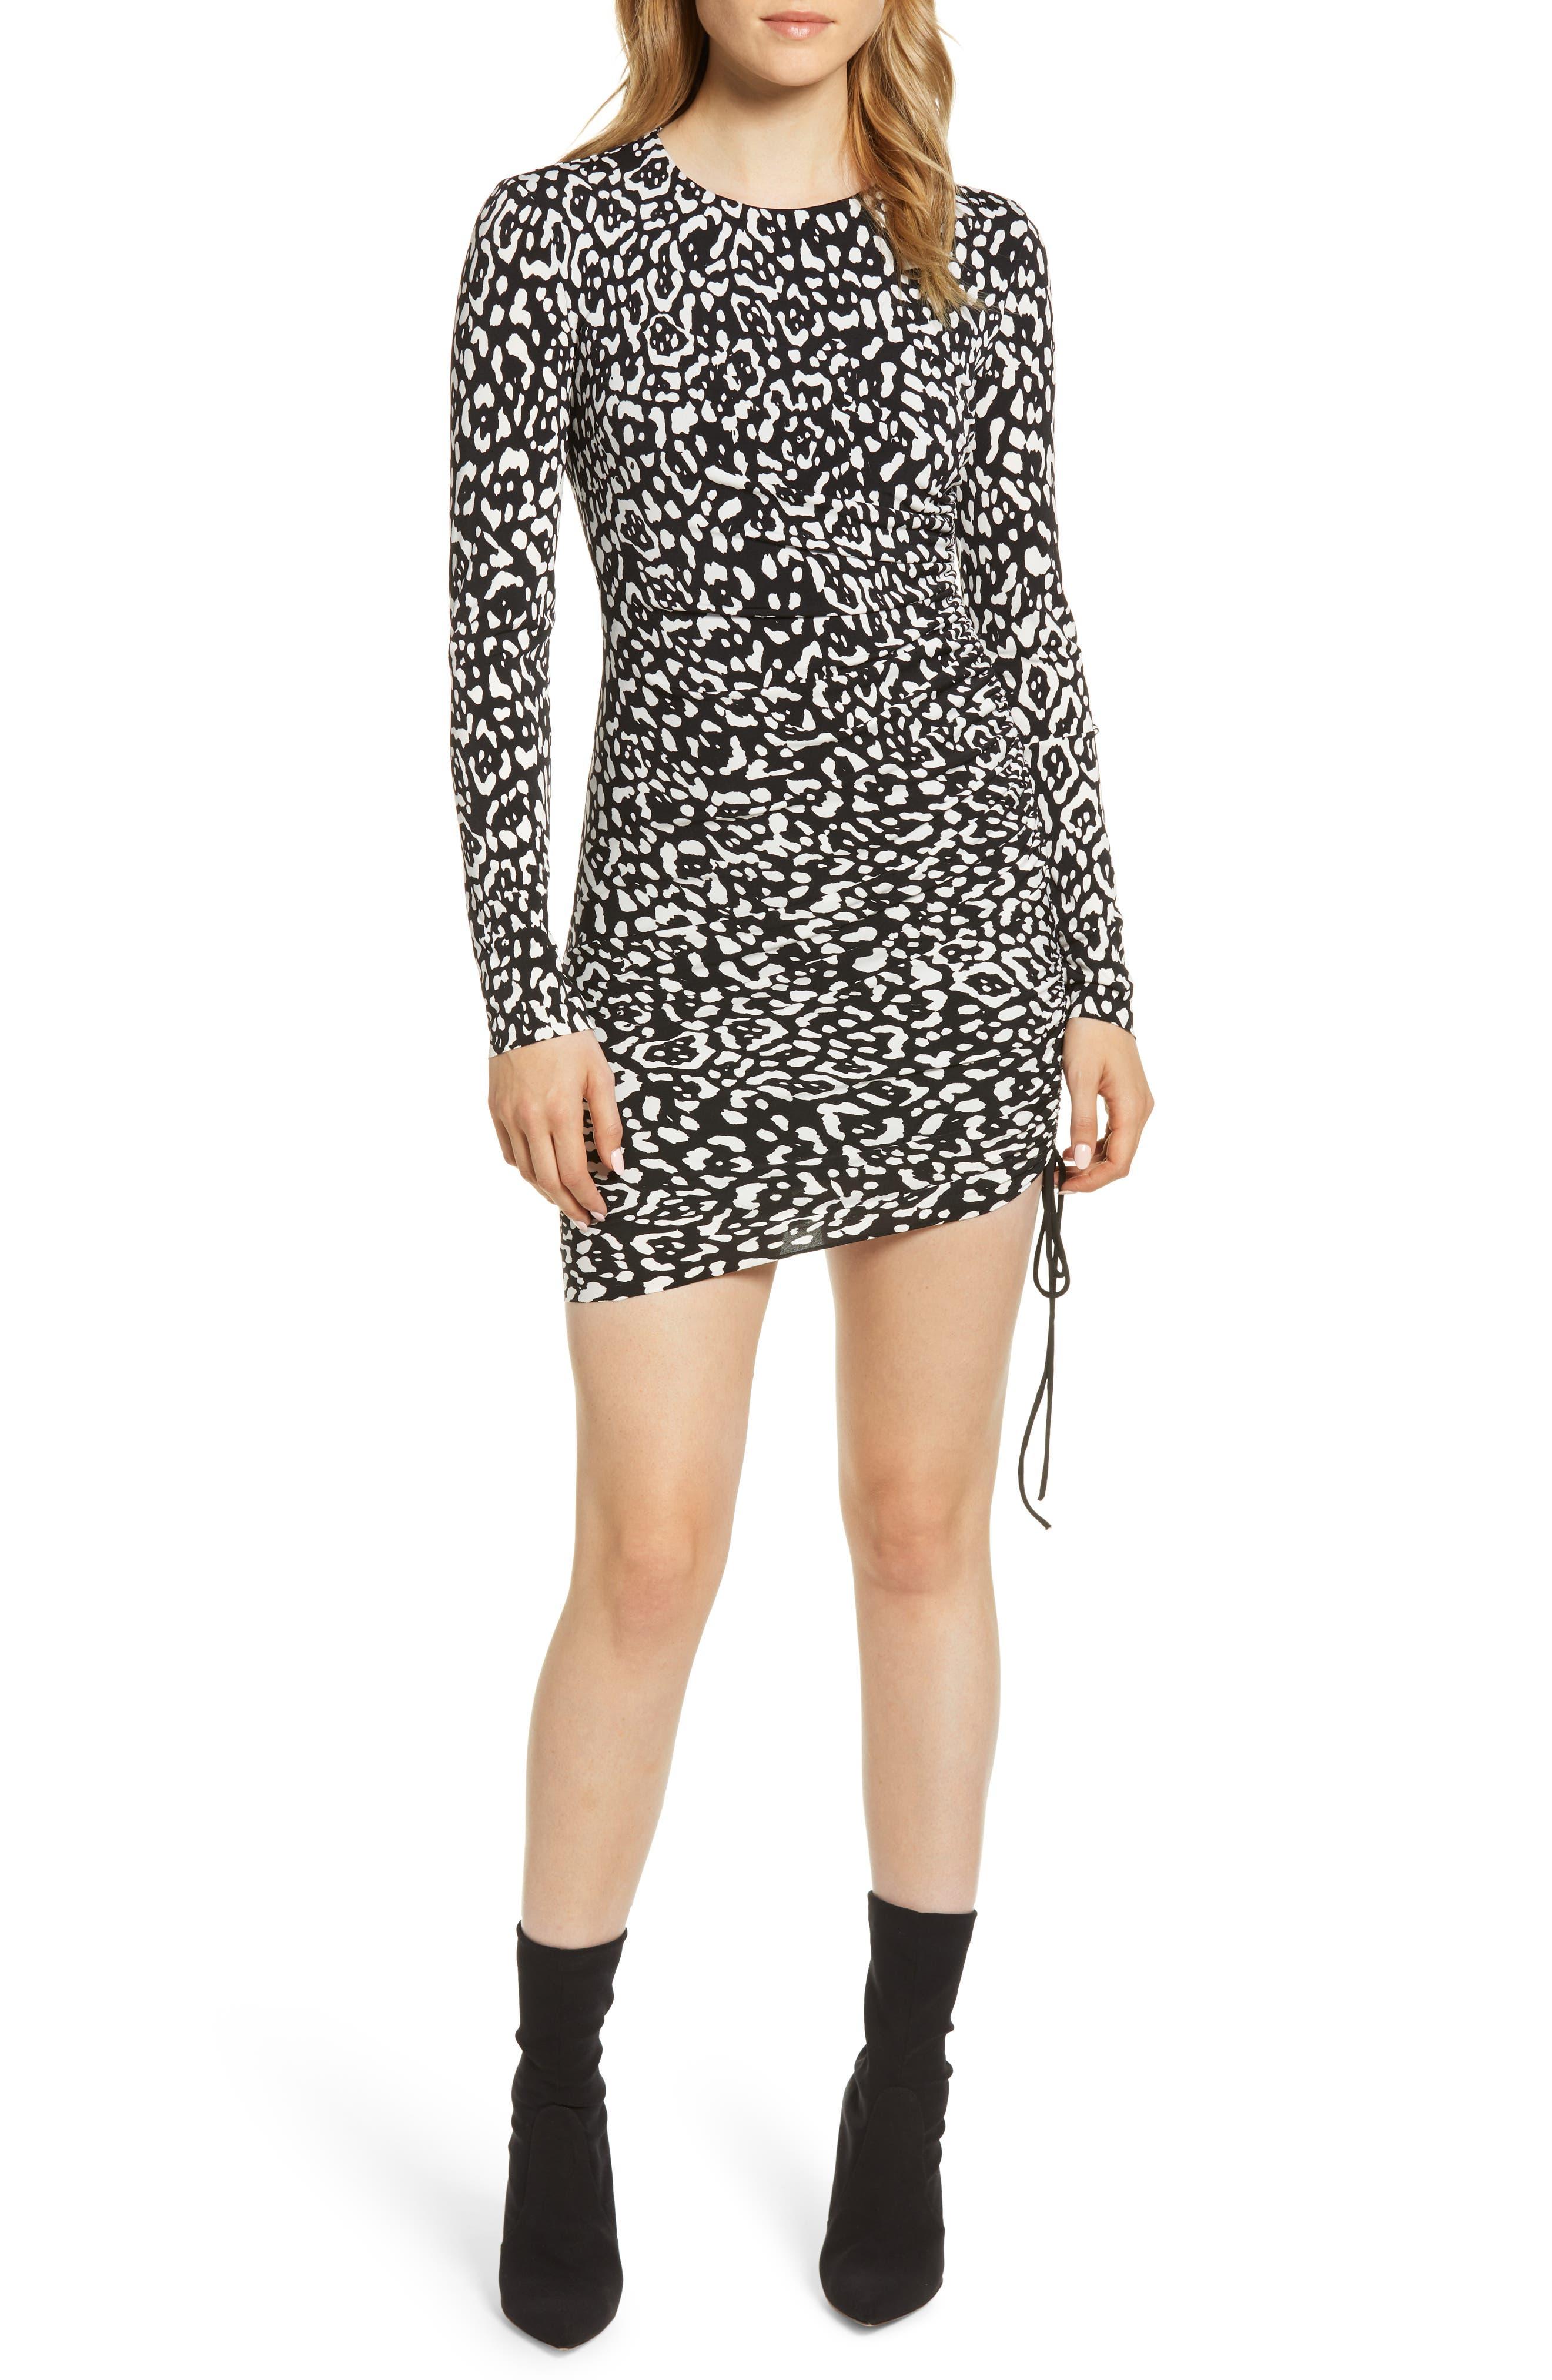 Boogie Wonderland Leopard Print Minidress, Main, color, BLACK/ CHALK